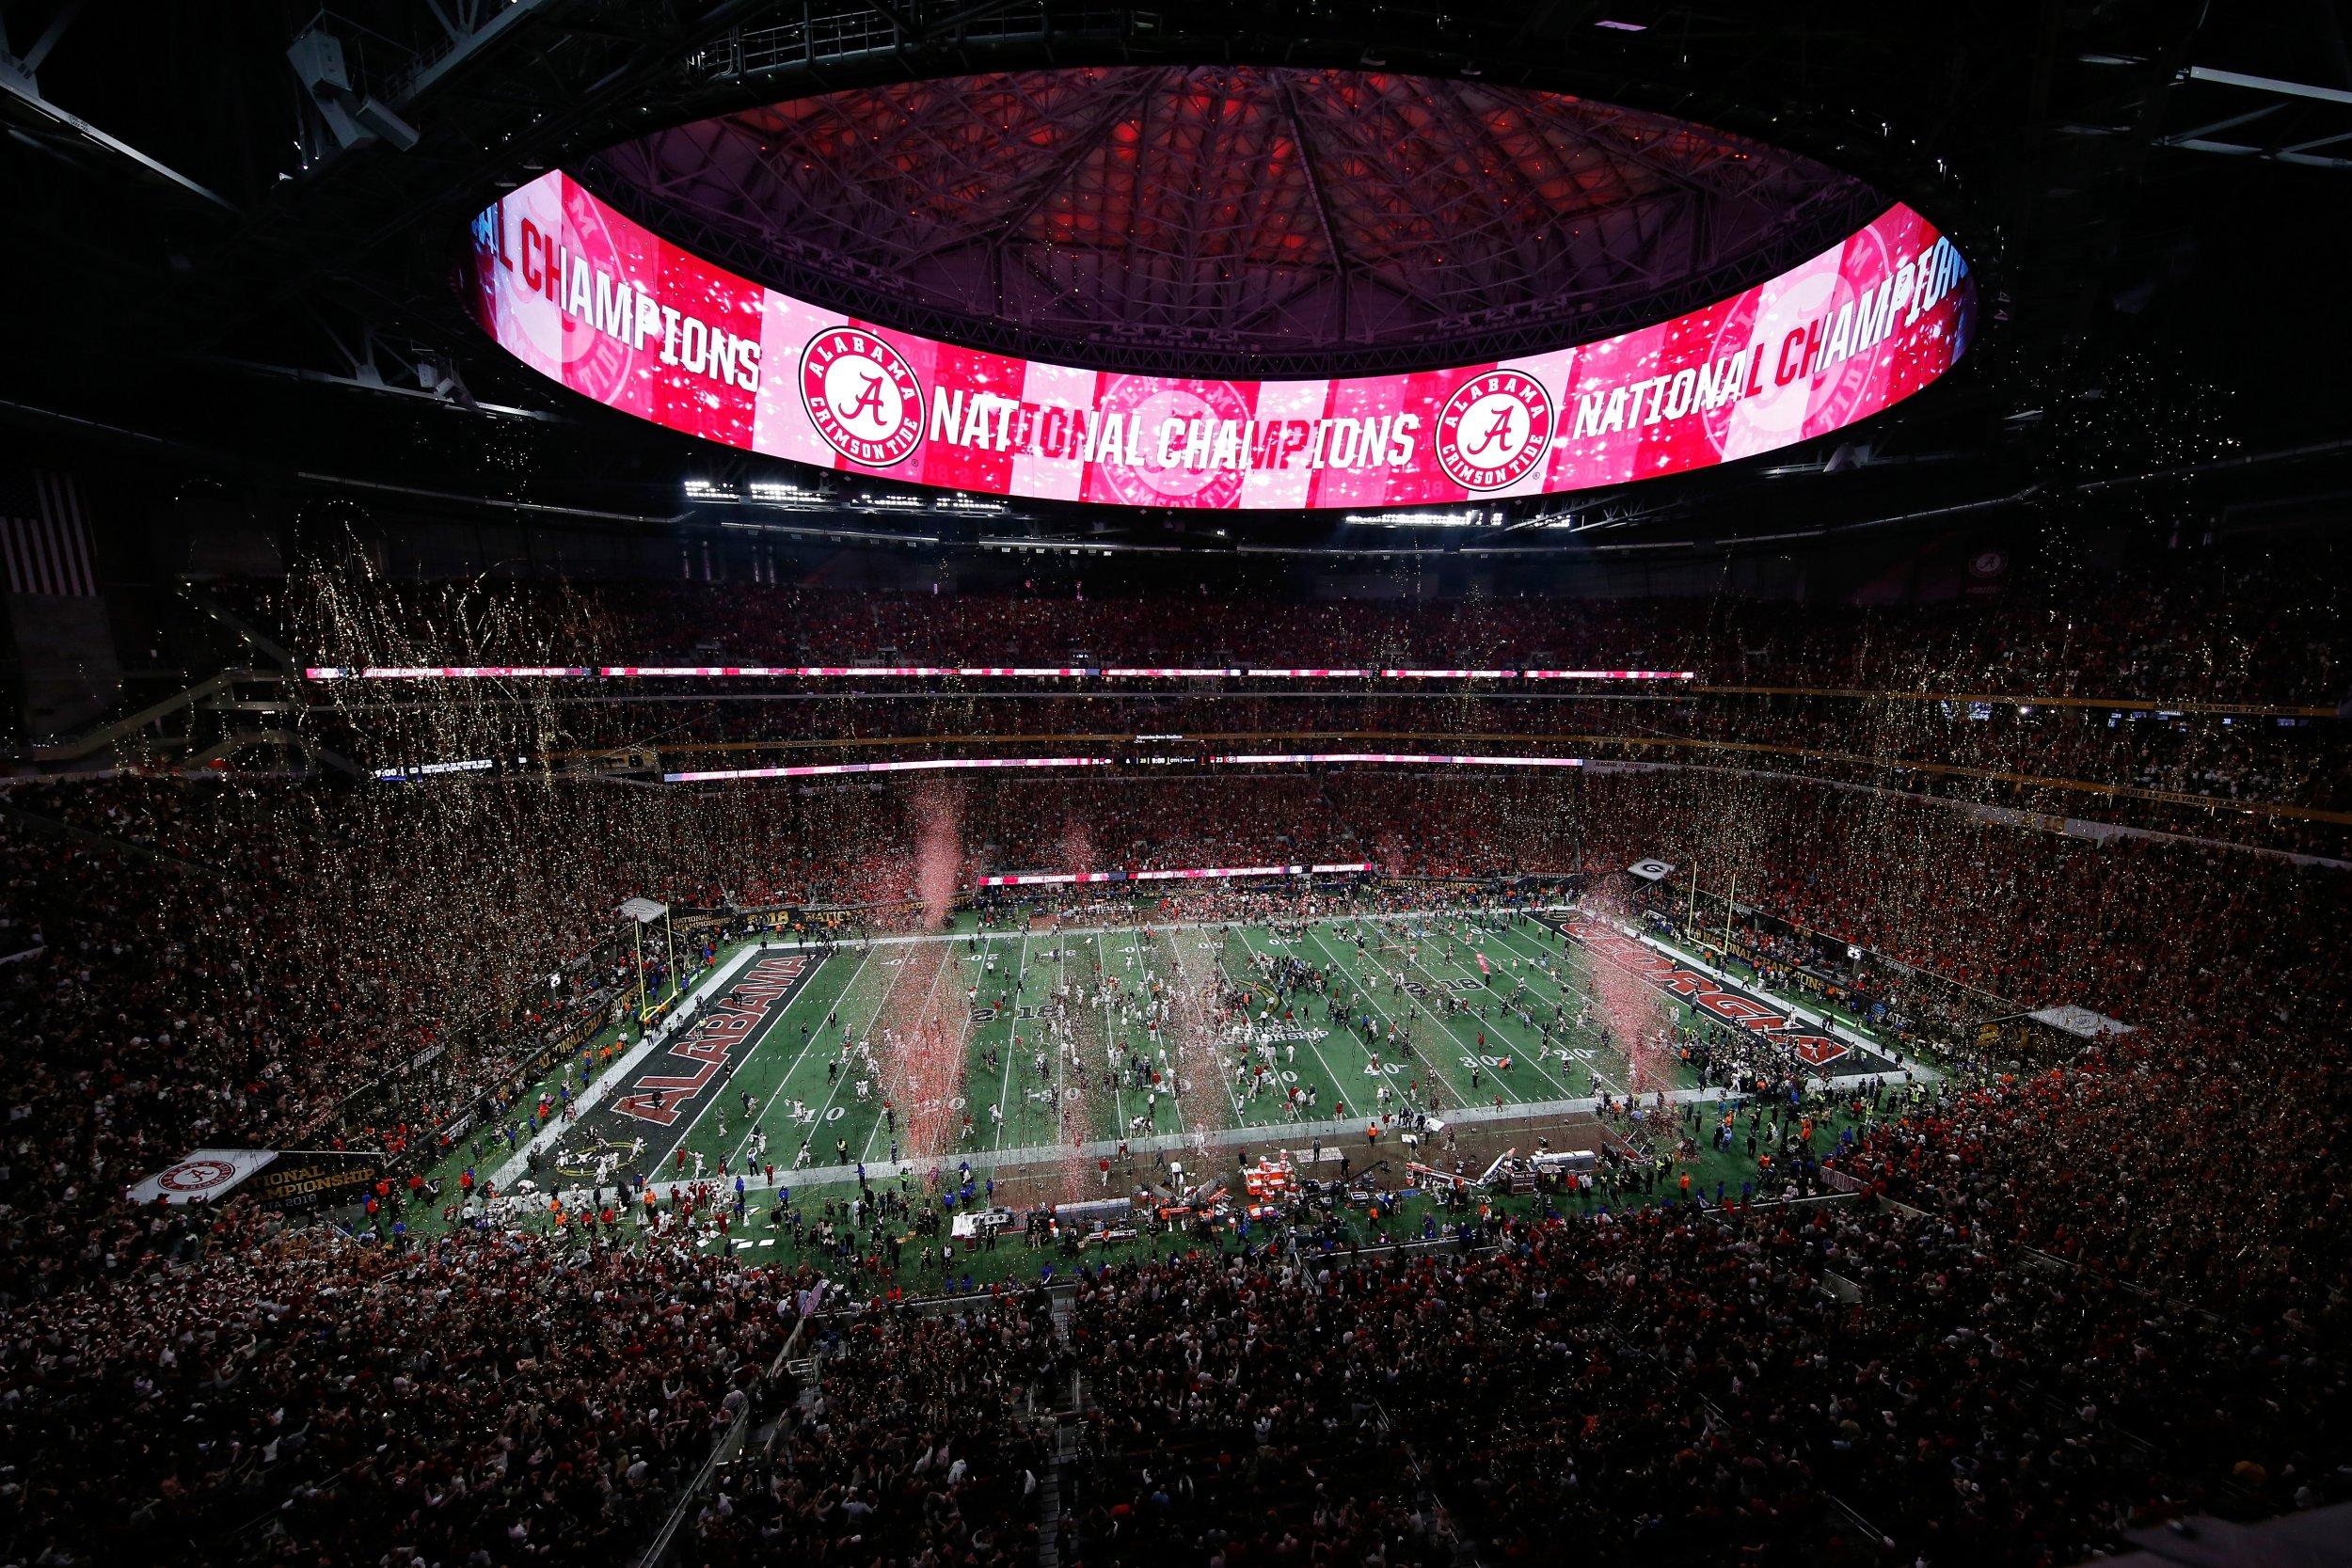 Mercedes-Benz Stadium in Atlanta, Georgia, as the Alabama Crimson Tide celebrates beating the Georgia Bulldogs, January 8.